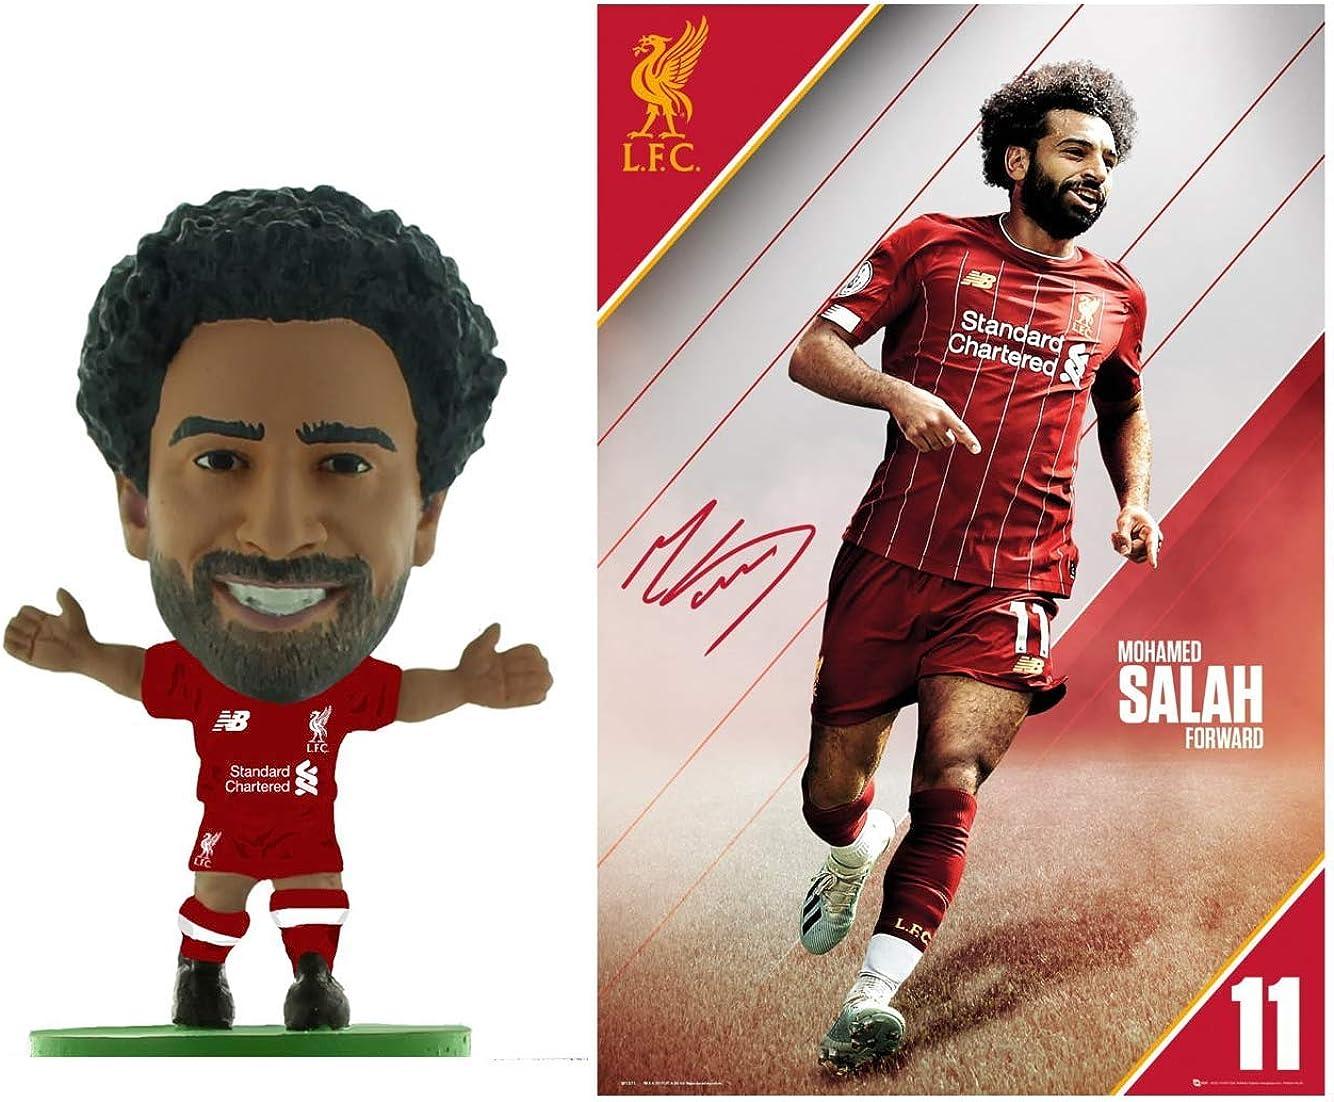 2 Pieces Mohamed Salah Figure /& Poster Combo Pack SoccerStarz Liverpool